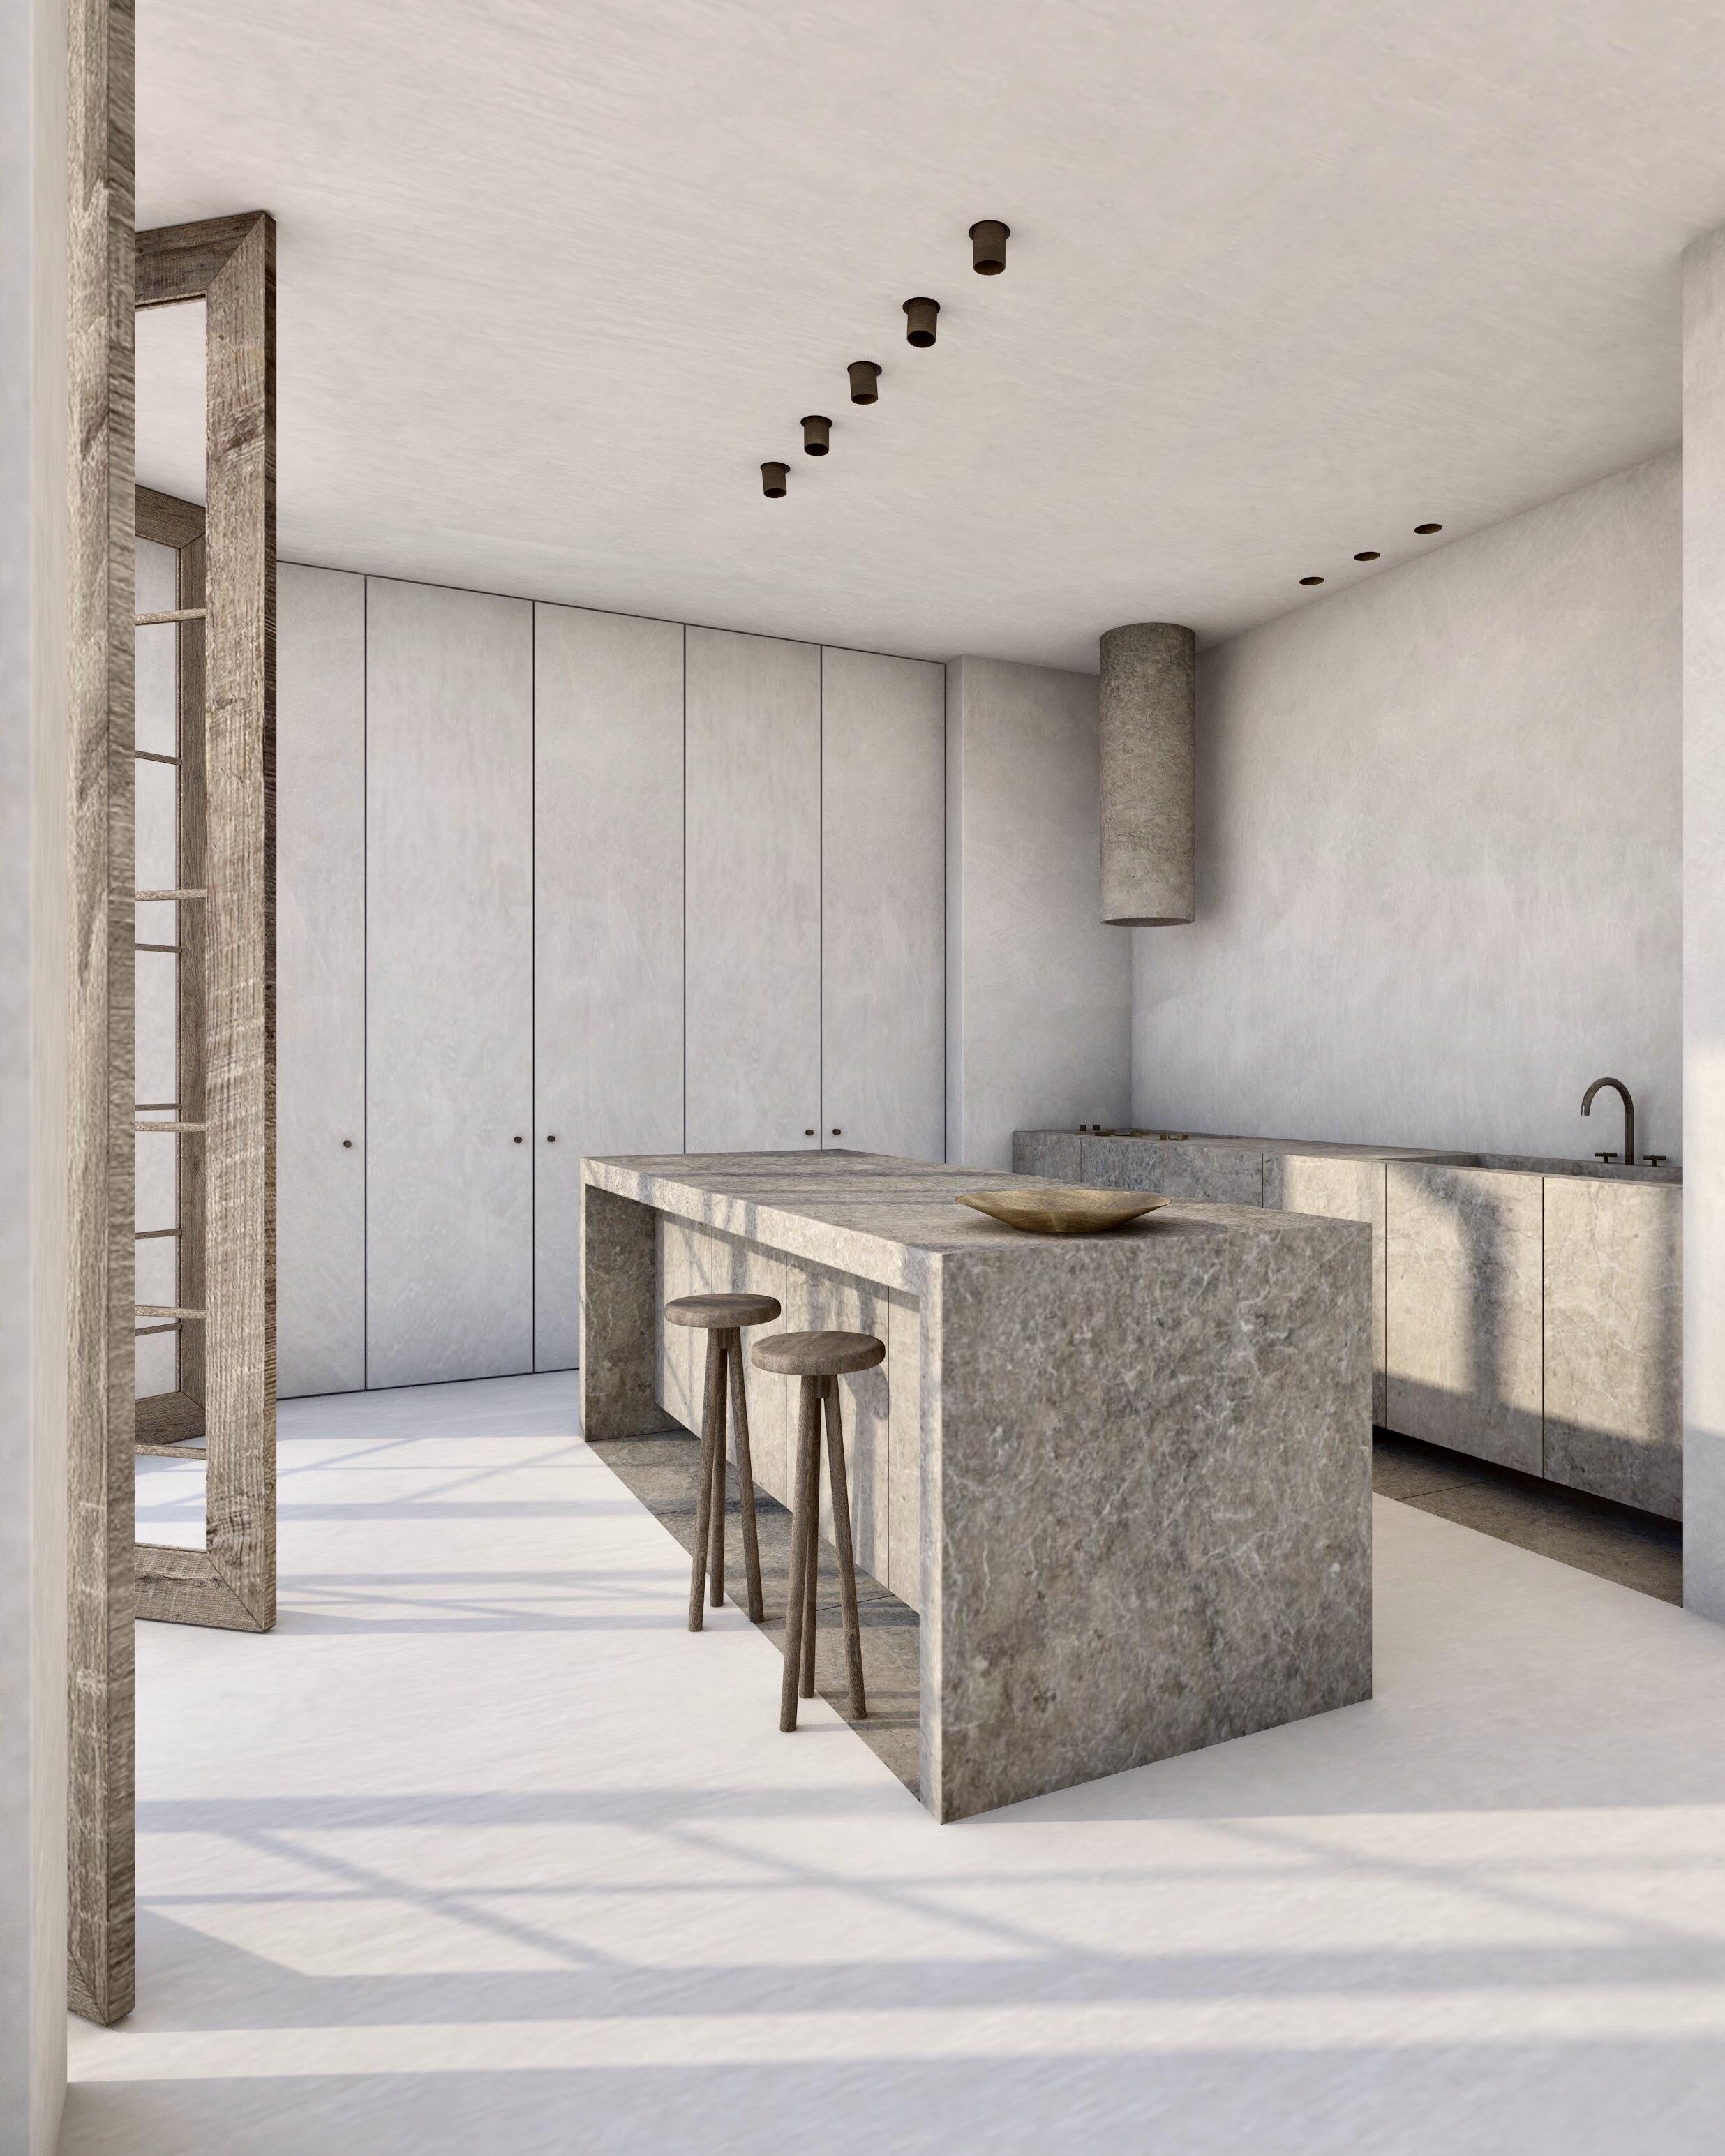 Studio Brent Lee Hinterland House 02